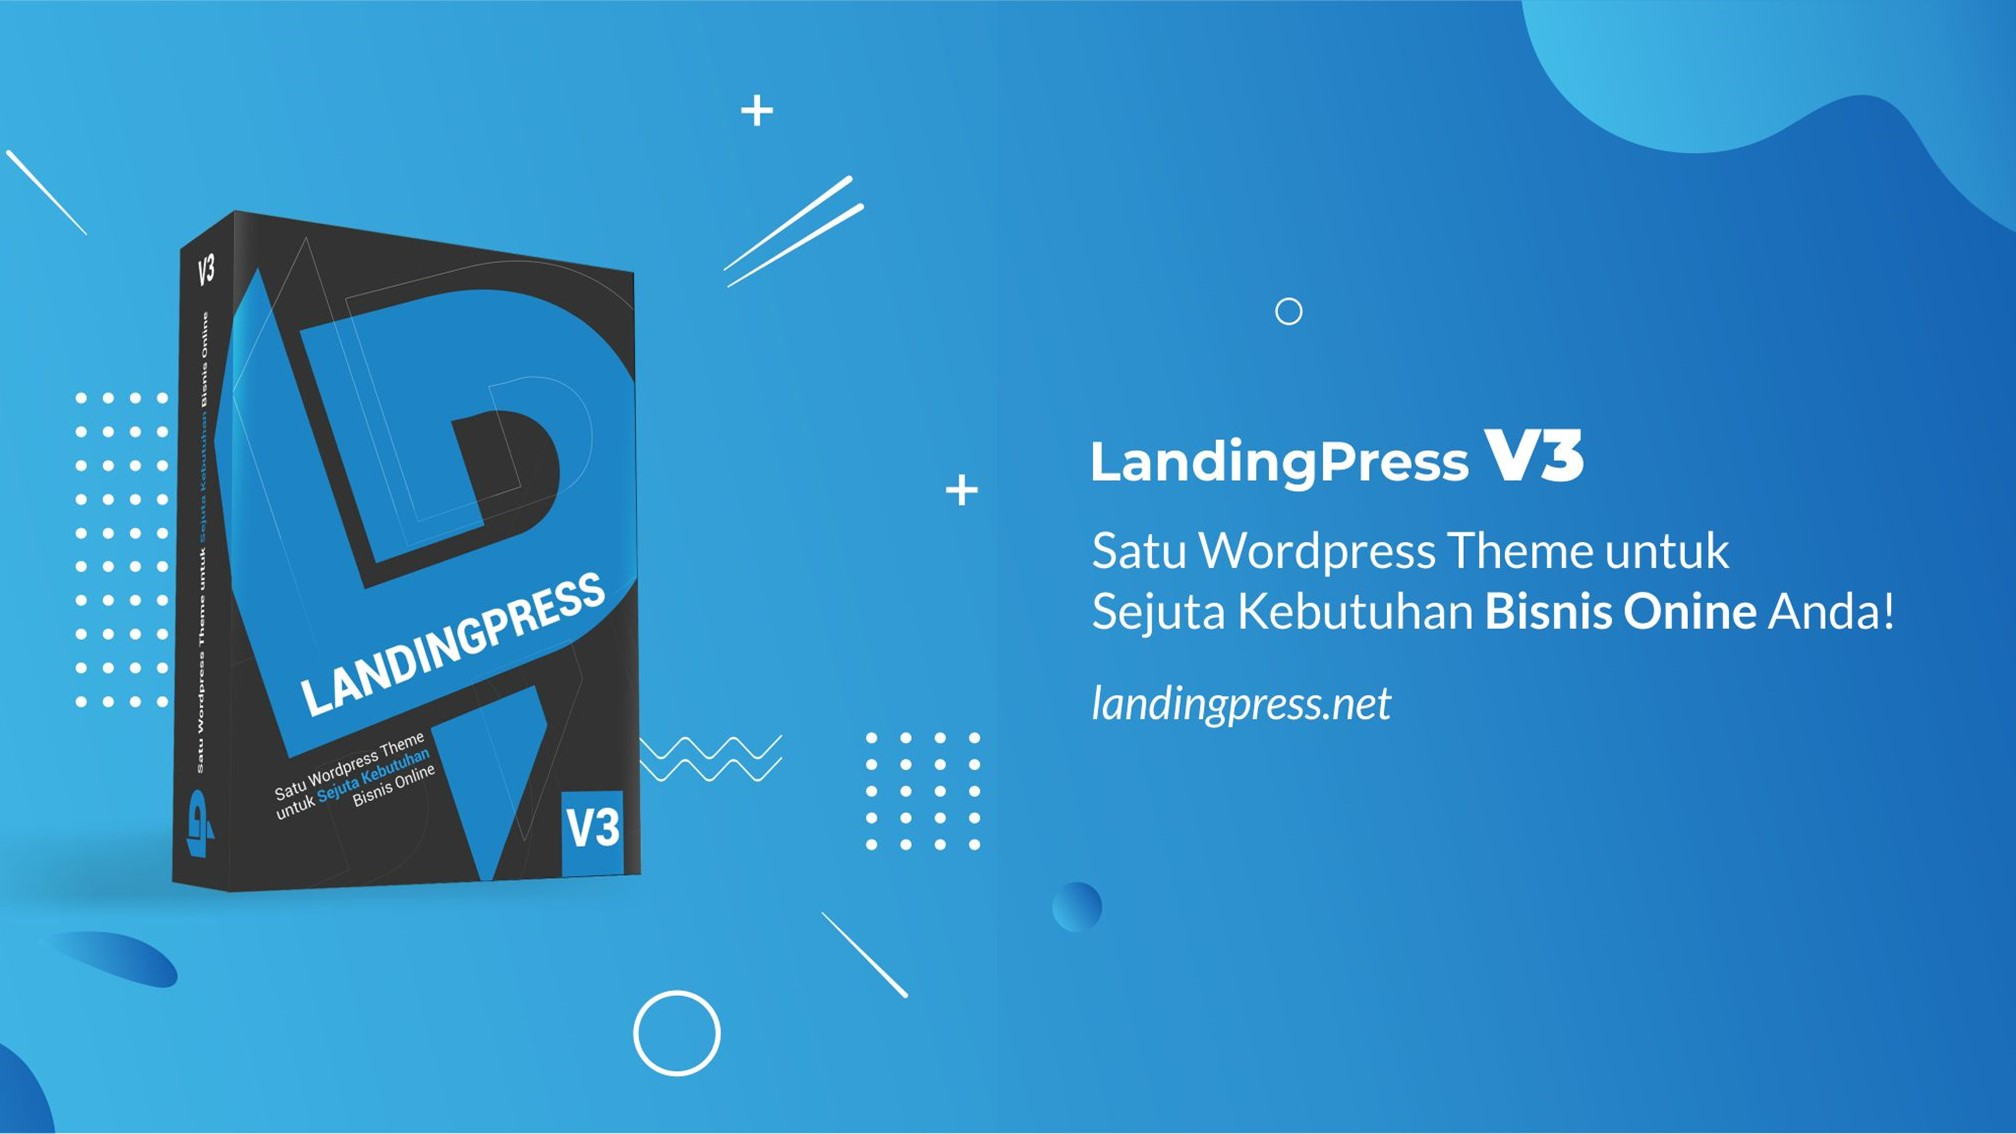 jual landingpress